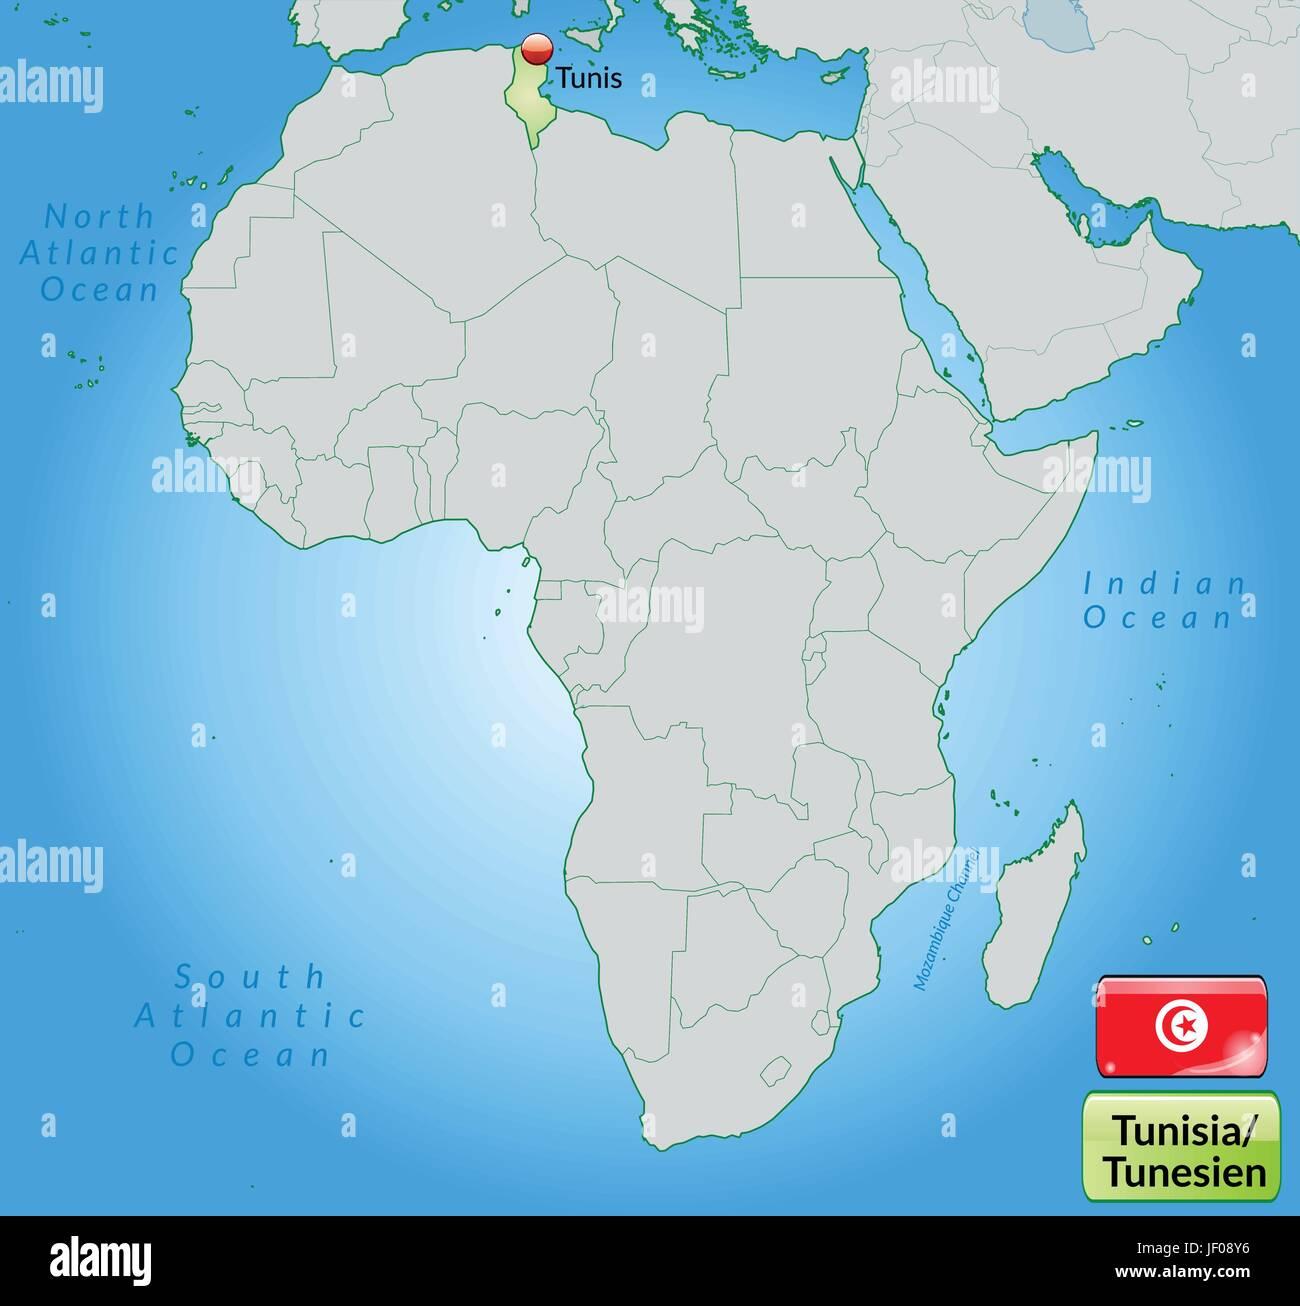 Tunesien Karte Welt.Tunis Karte Stockfotos Tunis Karte Bilder Alamy